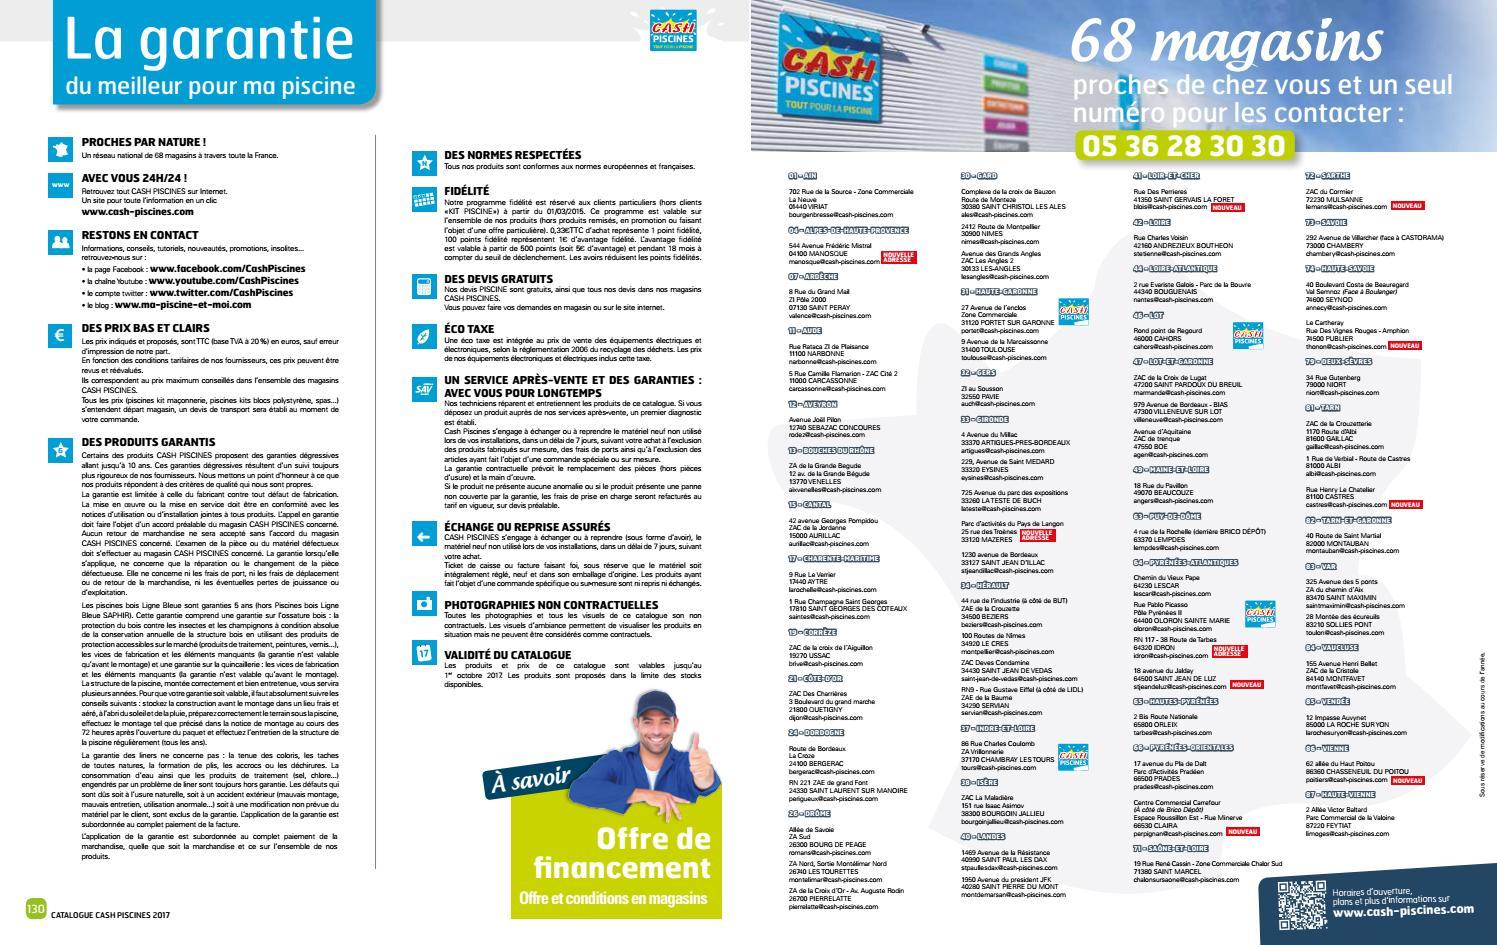 Catalogue Cash Piscine 2017 By Octave Octave - Issuu dedans Cash Piscine Nimes